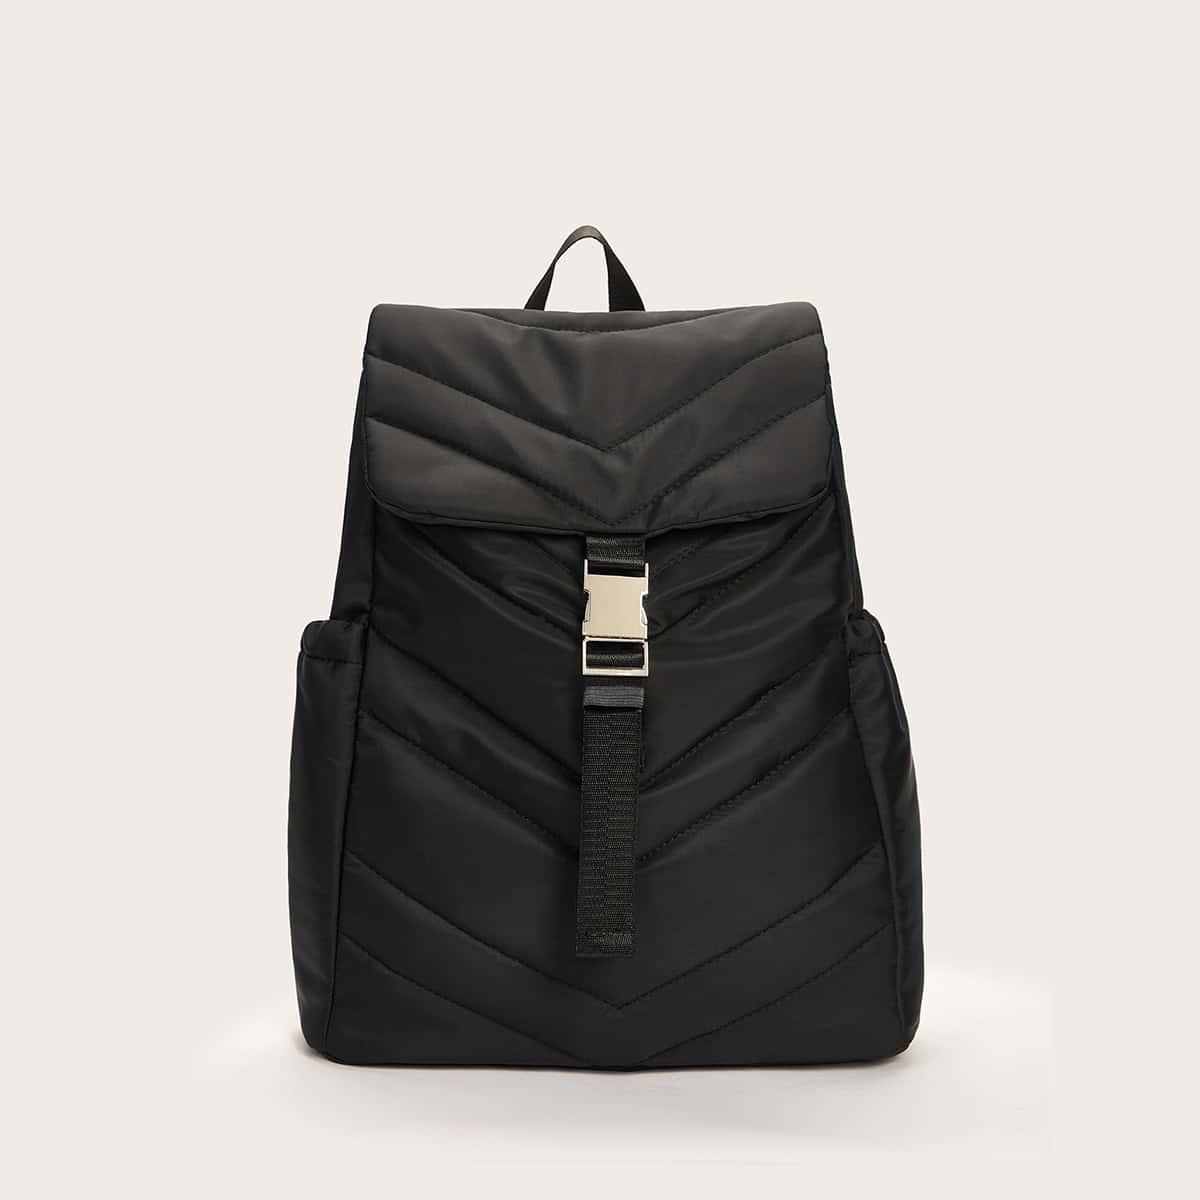 Рюкзак с пряжкой